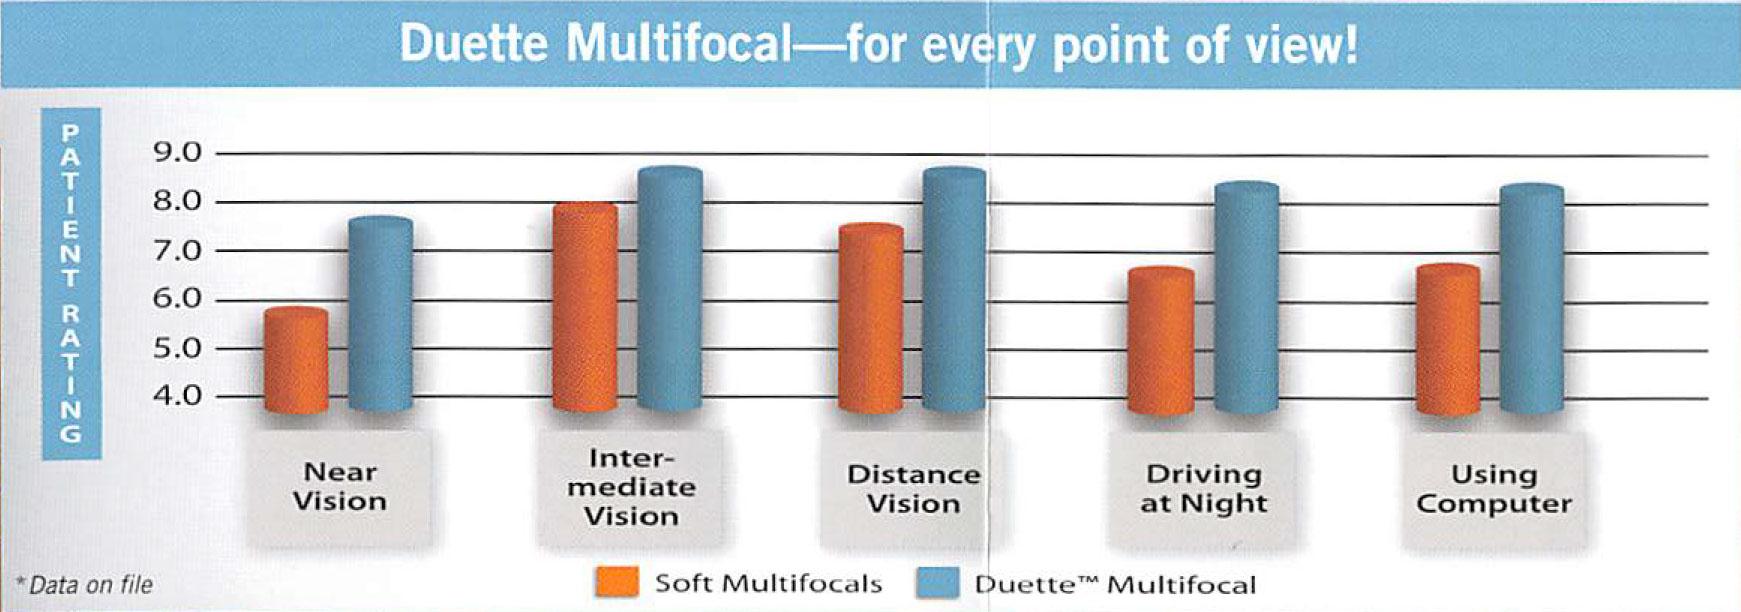 Duette Multifocal1